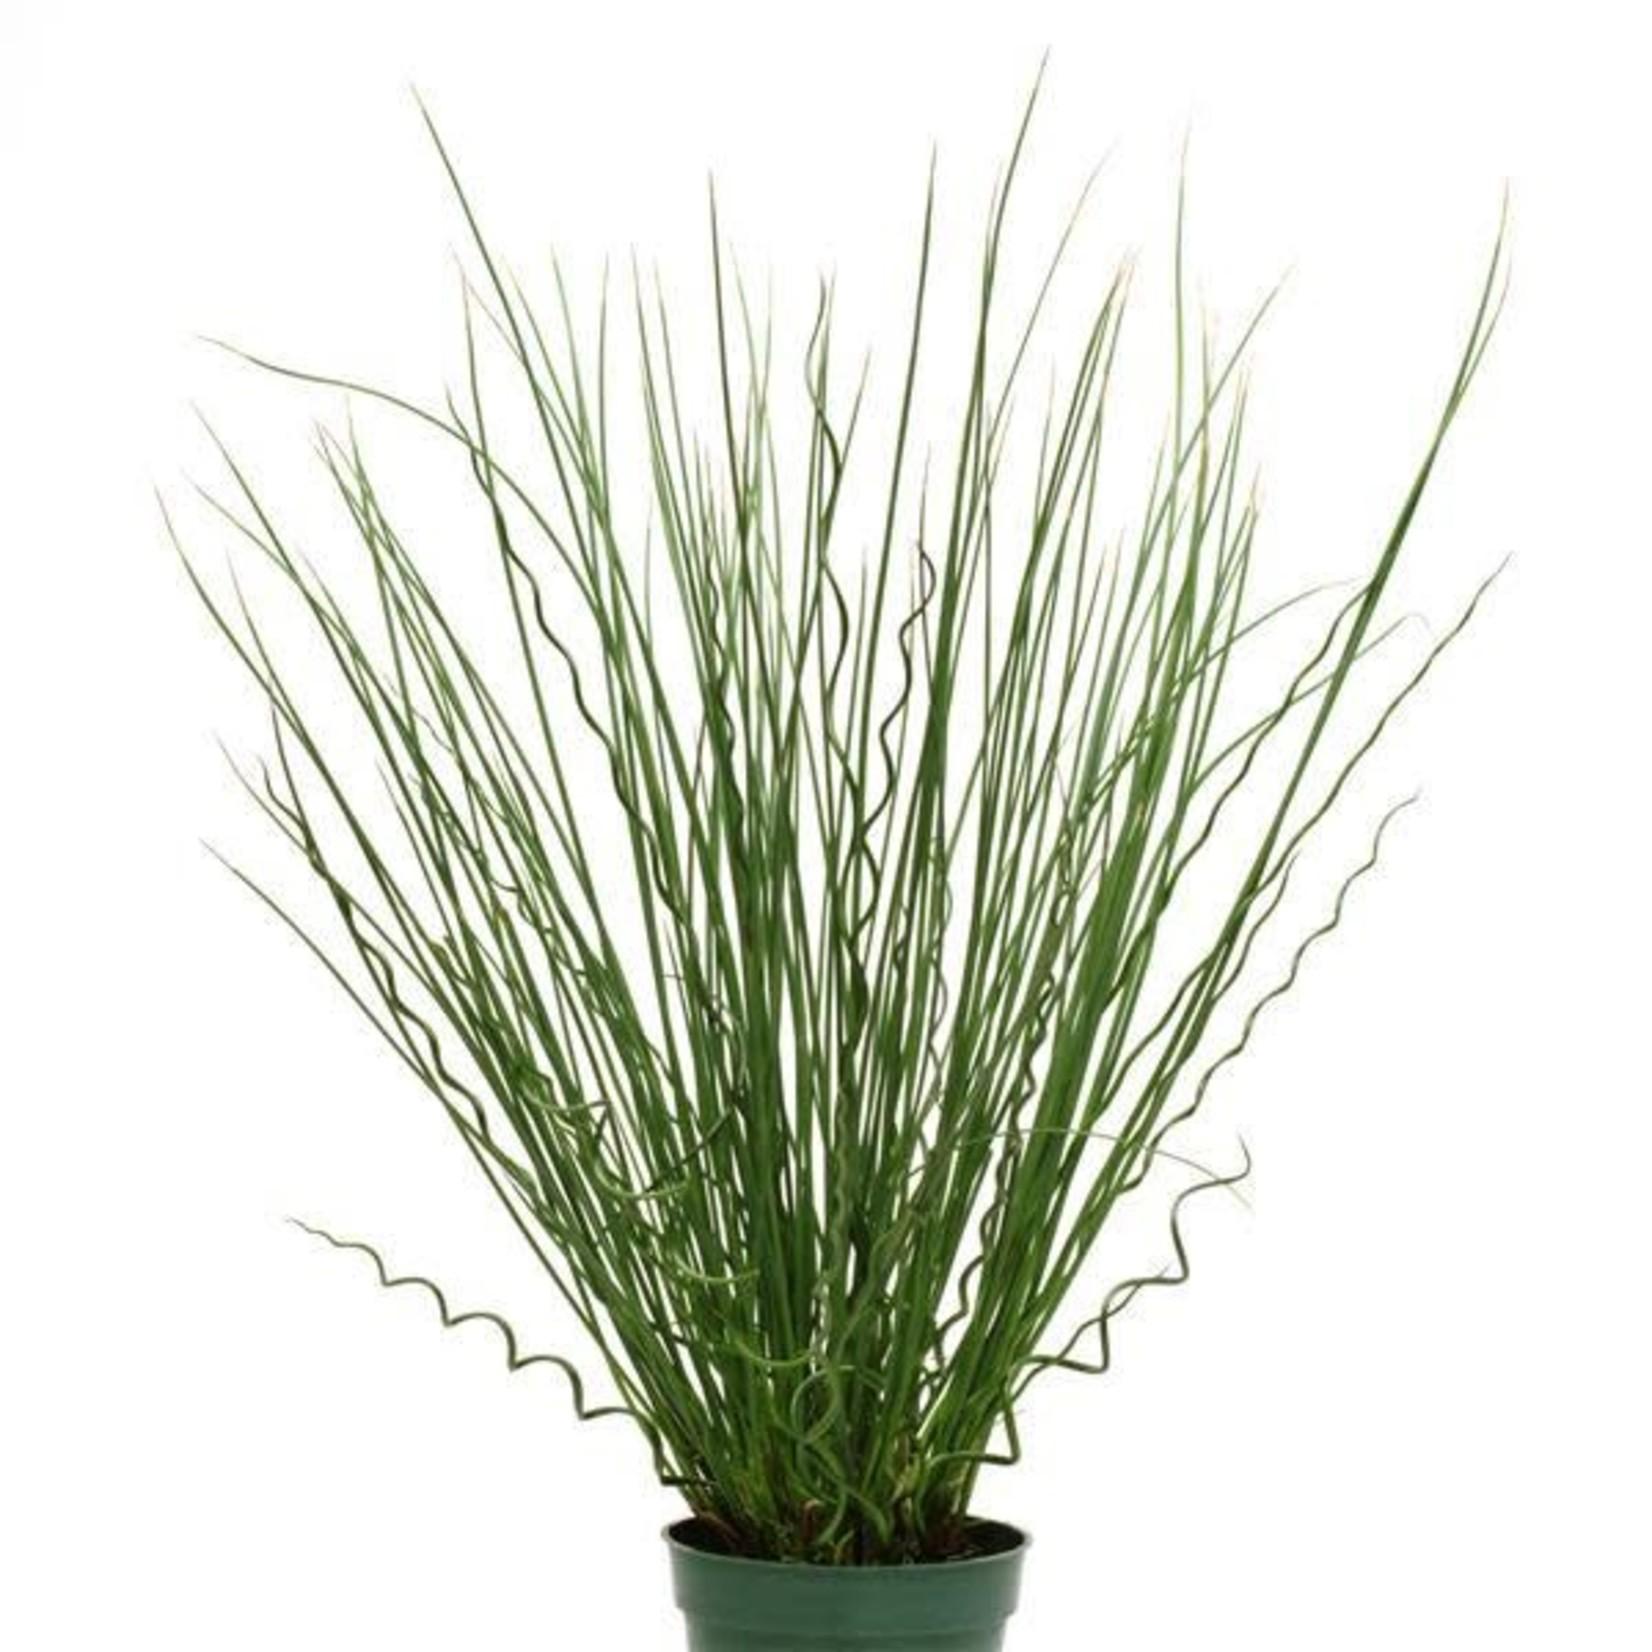 Grass 'Juncus Twisted Arrows' - 1 qt